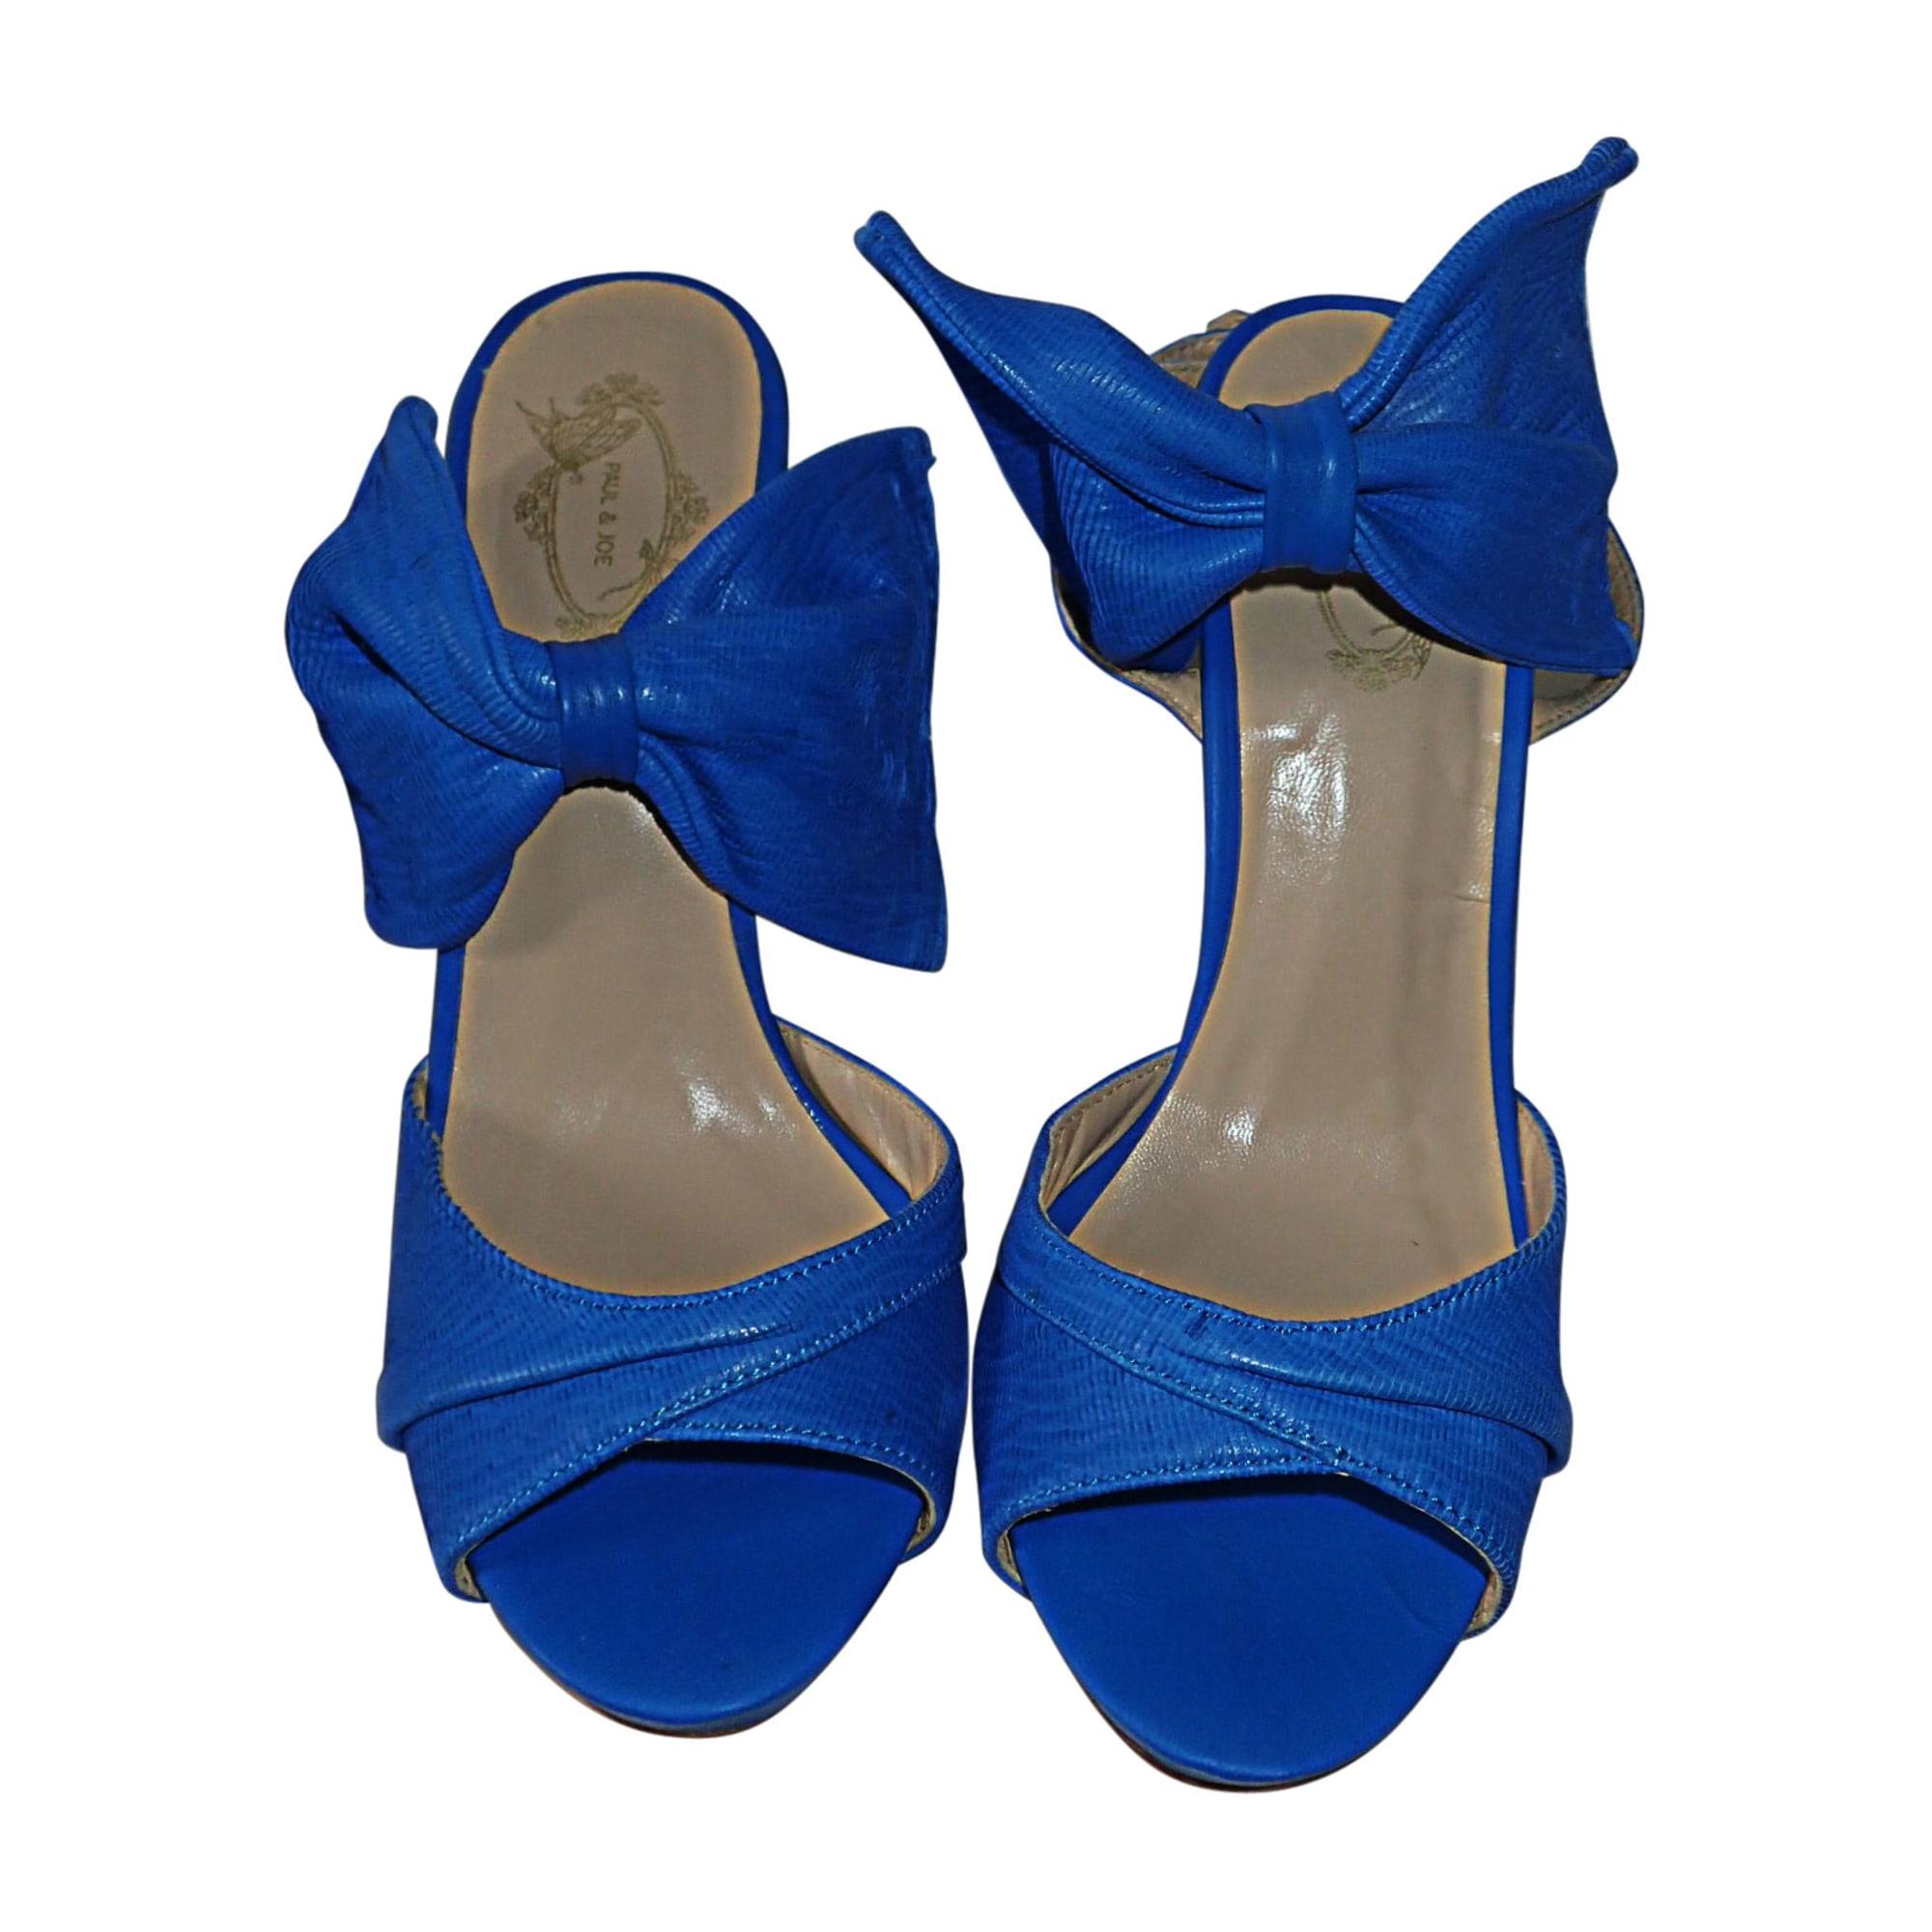 Escarpins PAUL & JOE Bleu, bleu marine, bleu turquoise